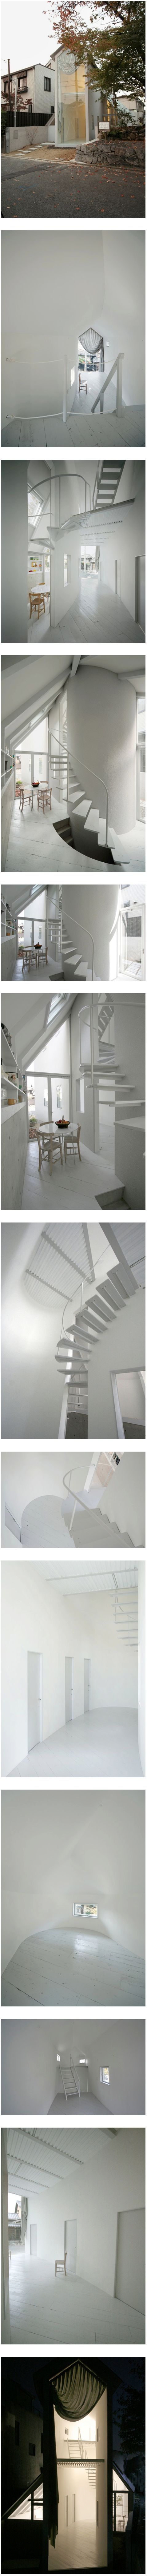 Hodeyuki Nakayama Architecture